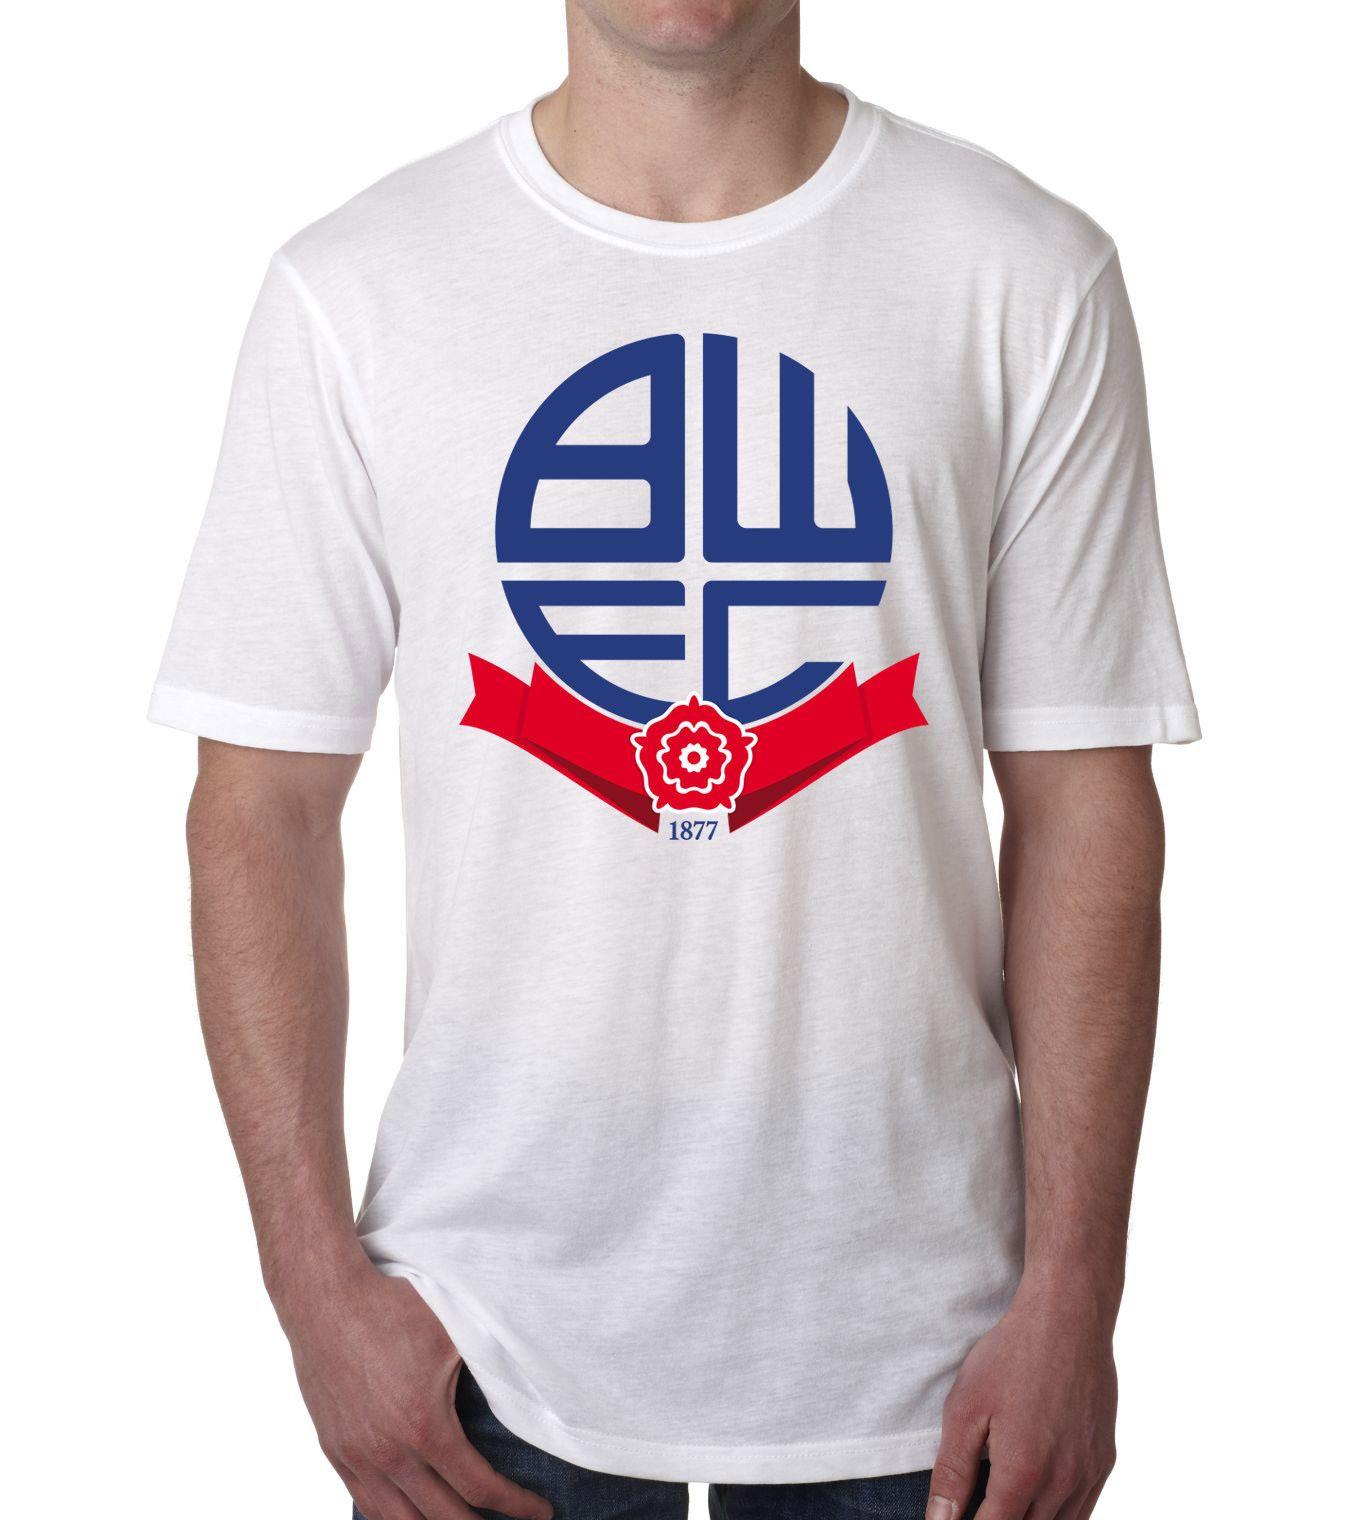 BOLTON WANDERERS FC Logo Badge Crest Football Fan T Shirt 2018 Fashionable  Brand 100%cotton Printed Round Custom Printed Tshirt T Shirts T Shirts T  Tee ... 4cd928490